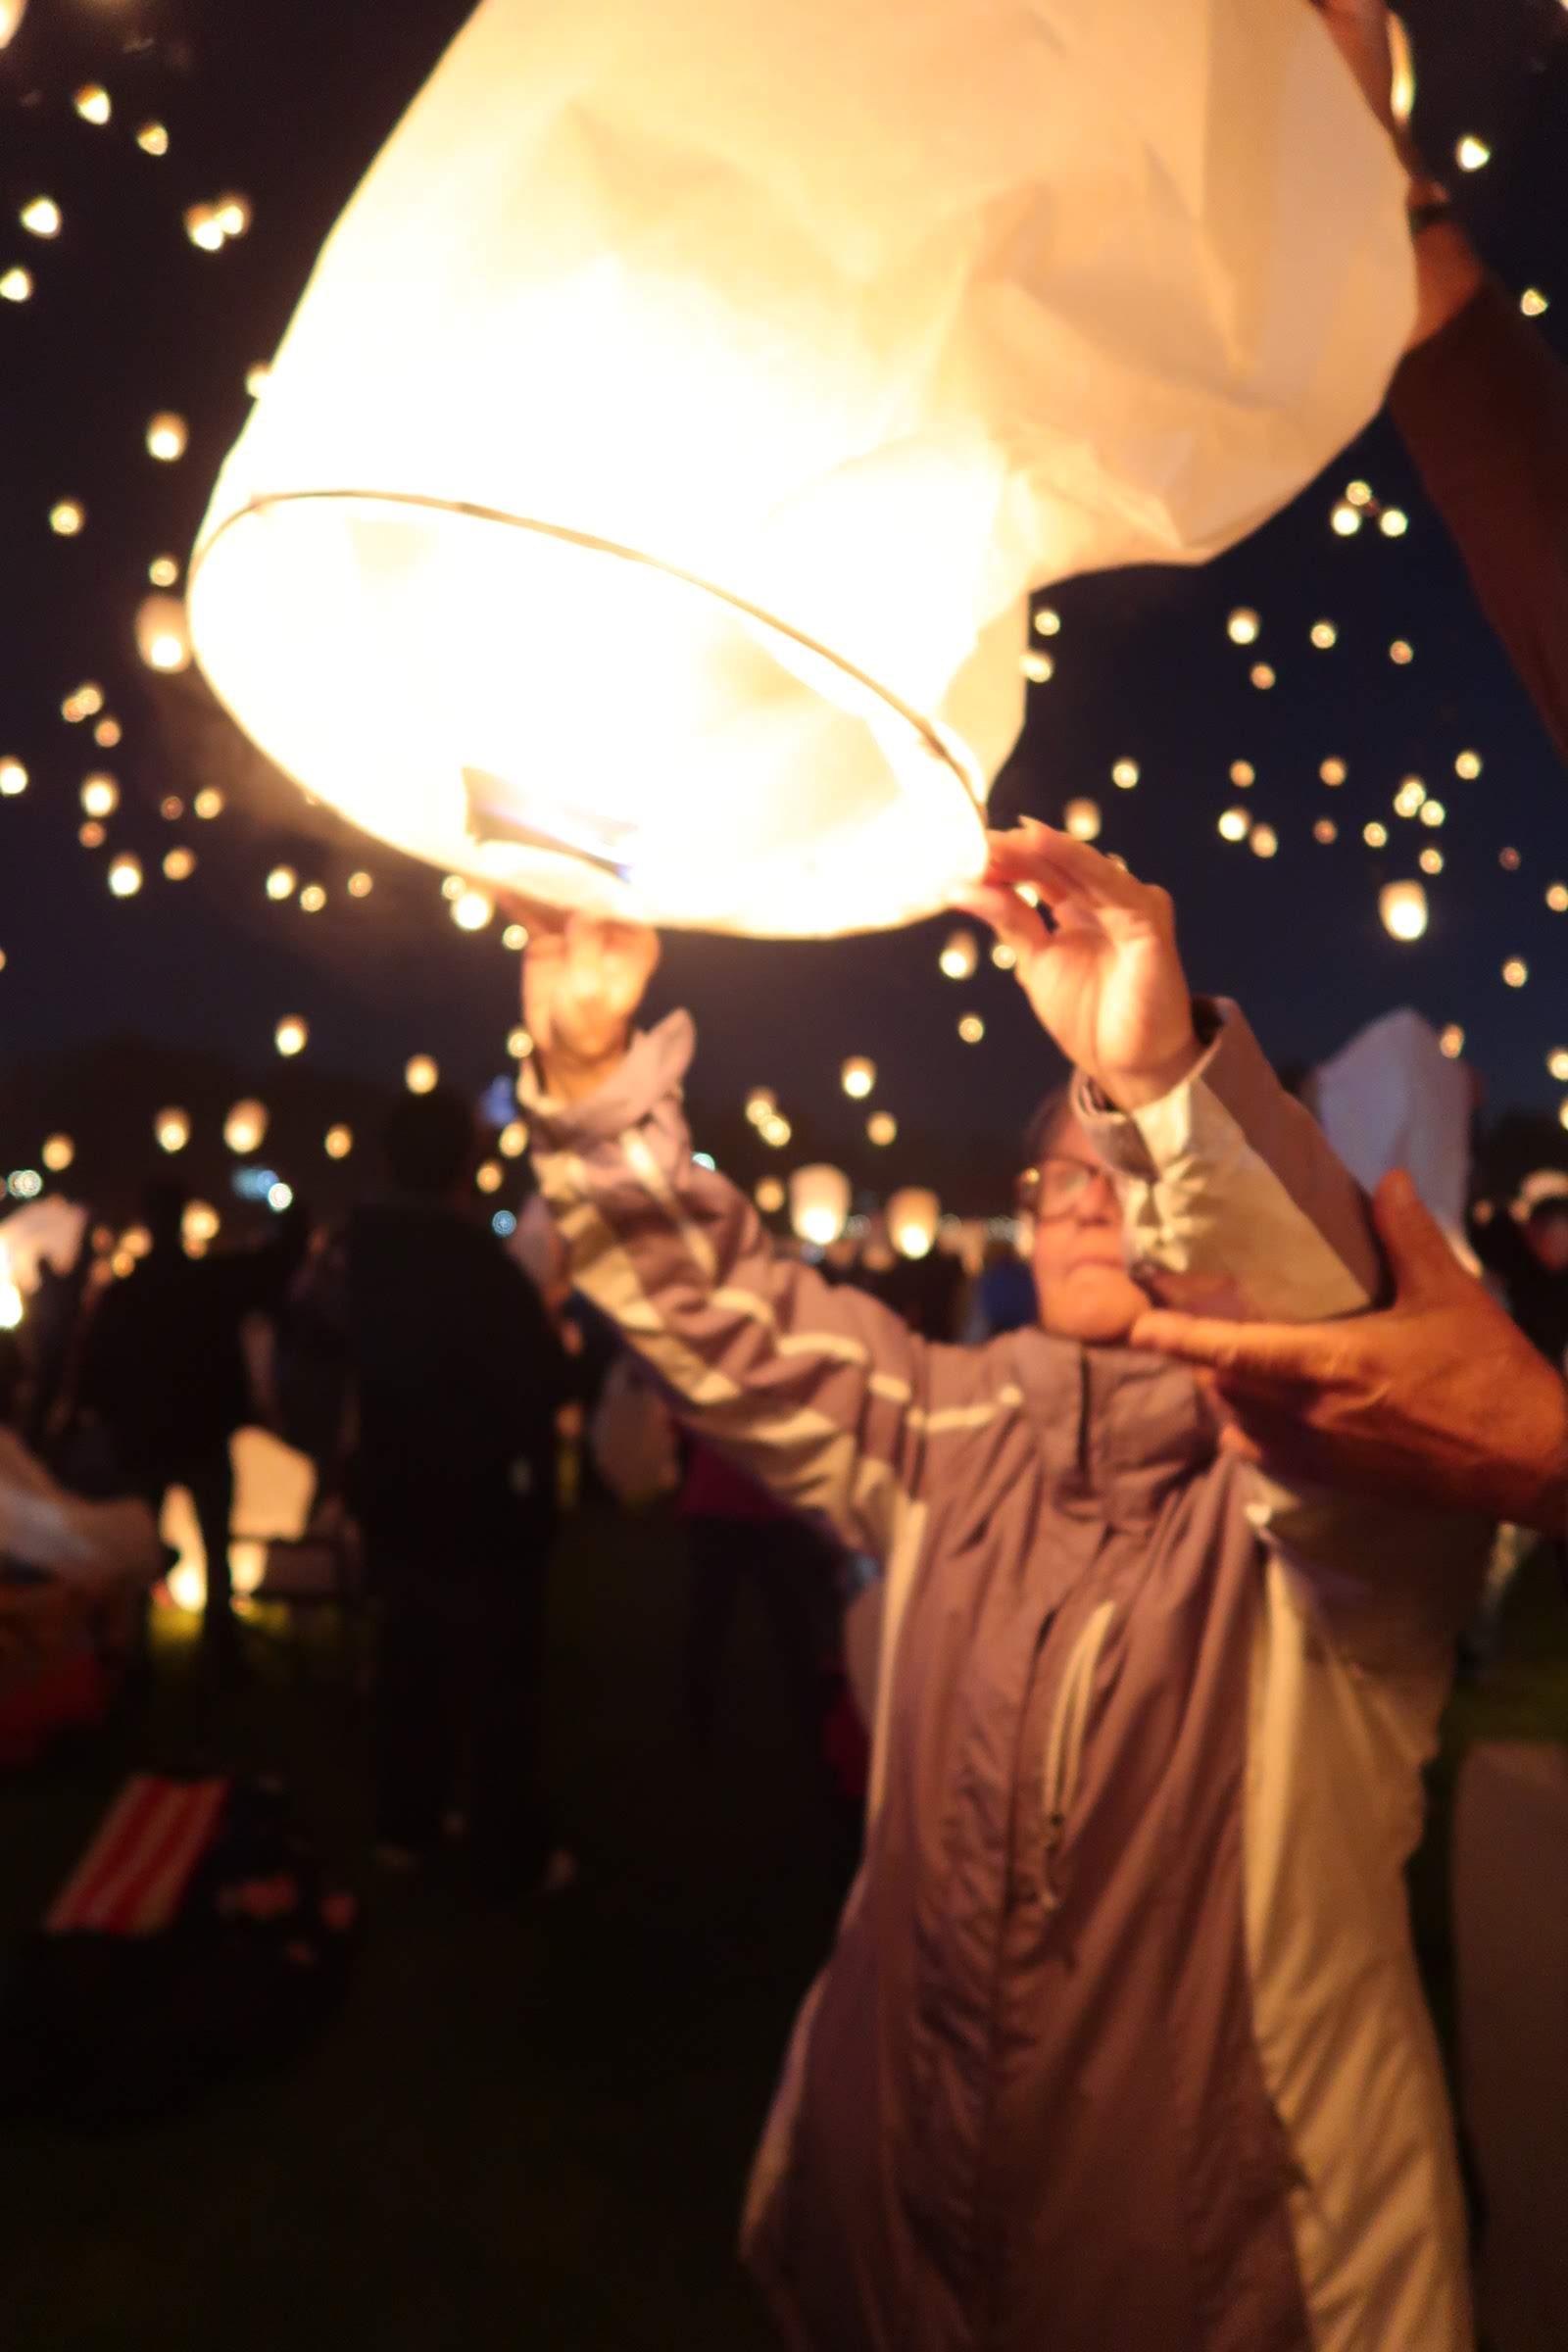 The Lights Fest   It's Megan Blog   #lanternfestival #lanterns #lightsfestival #tangled